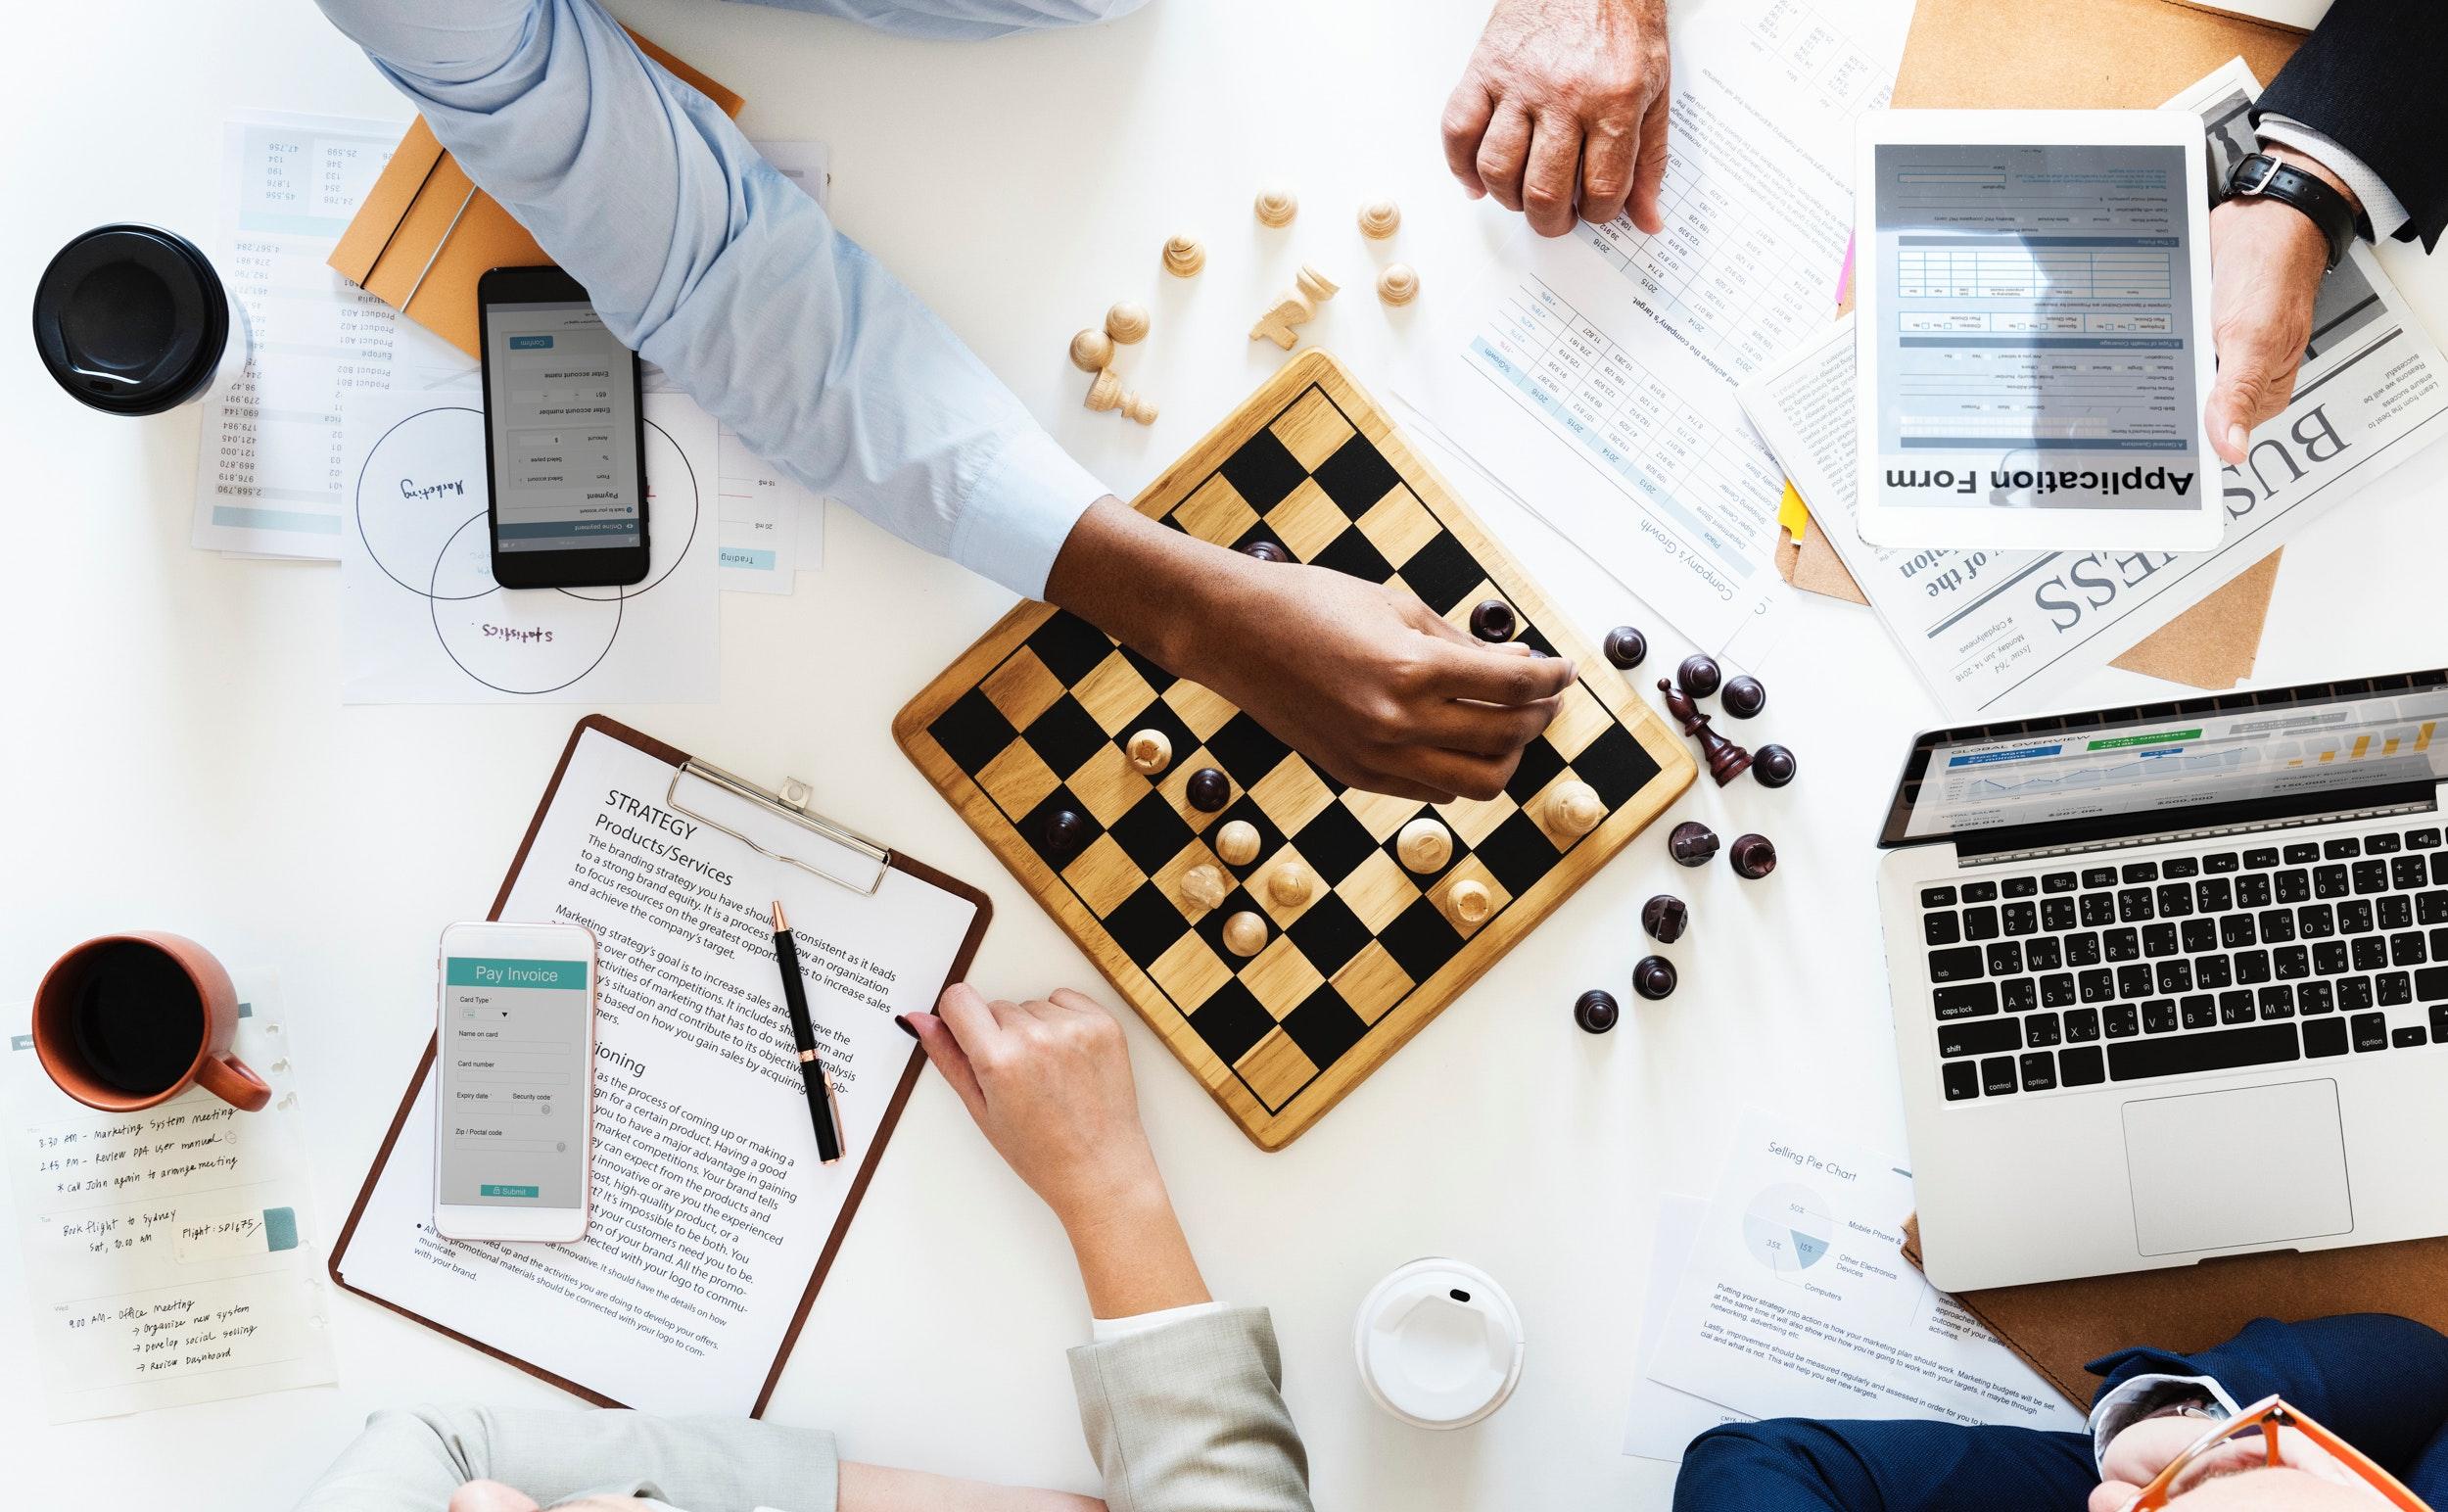 business-cellphone-chess-910330